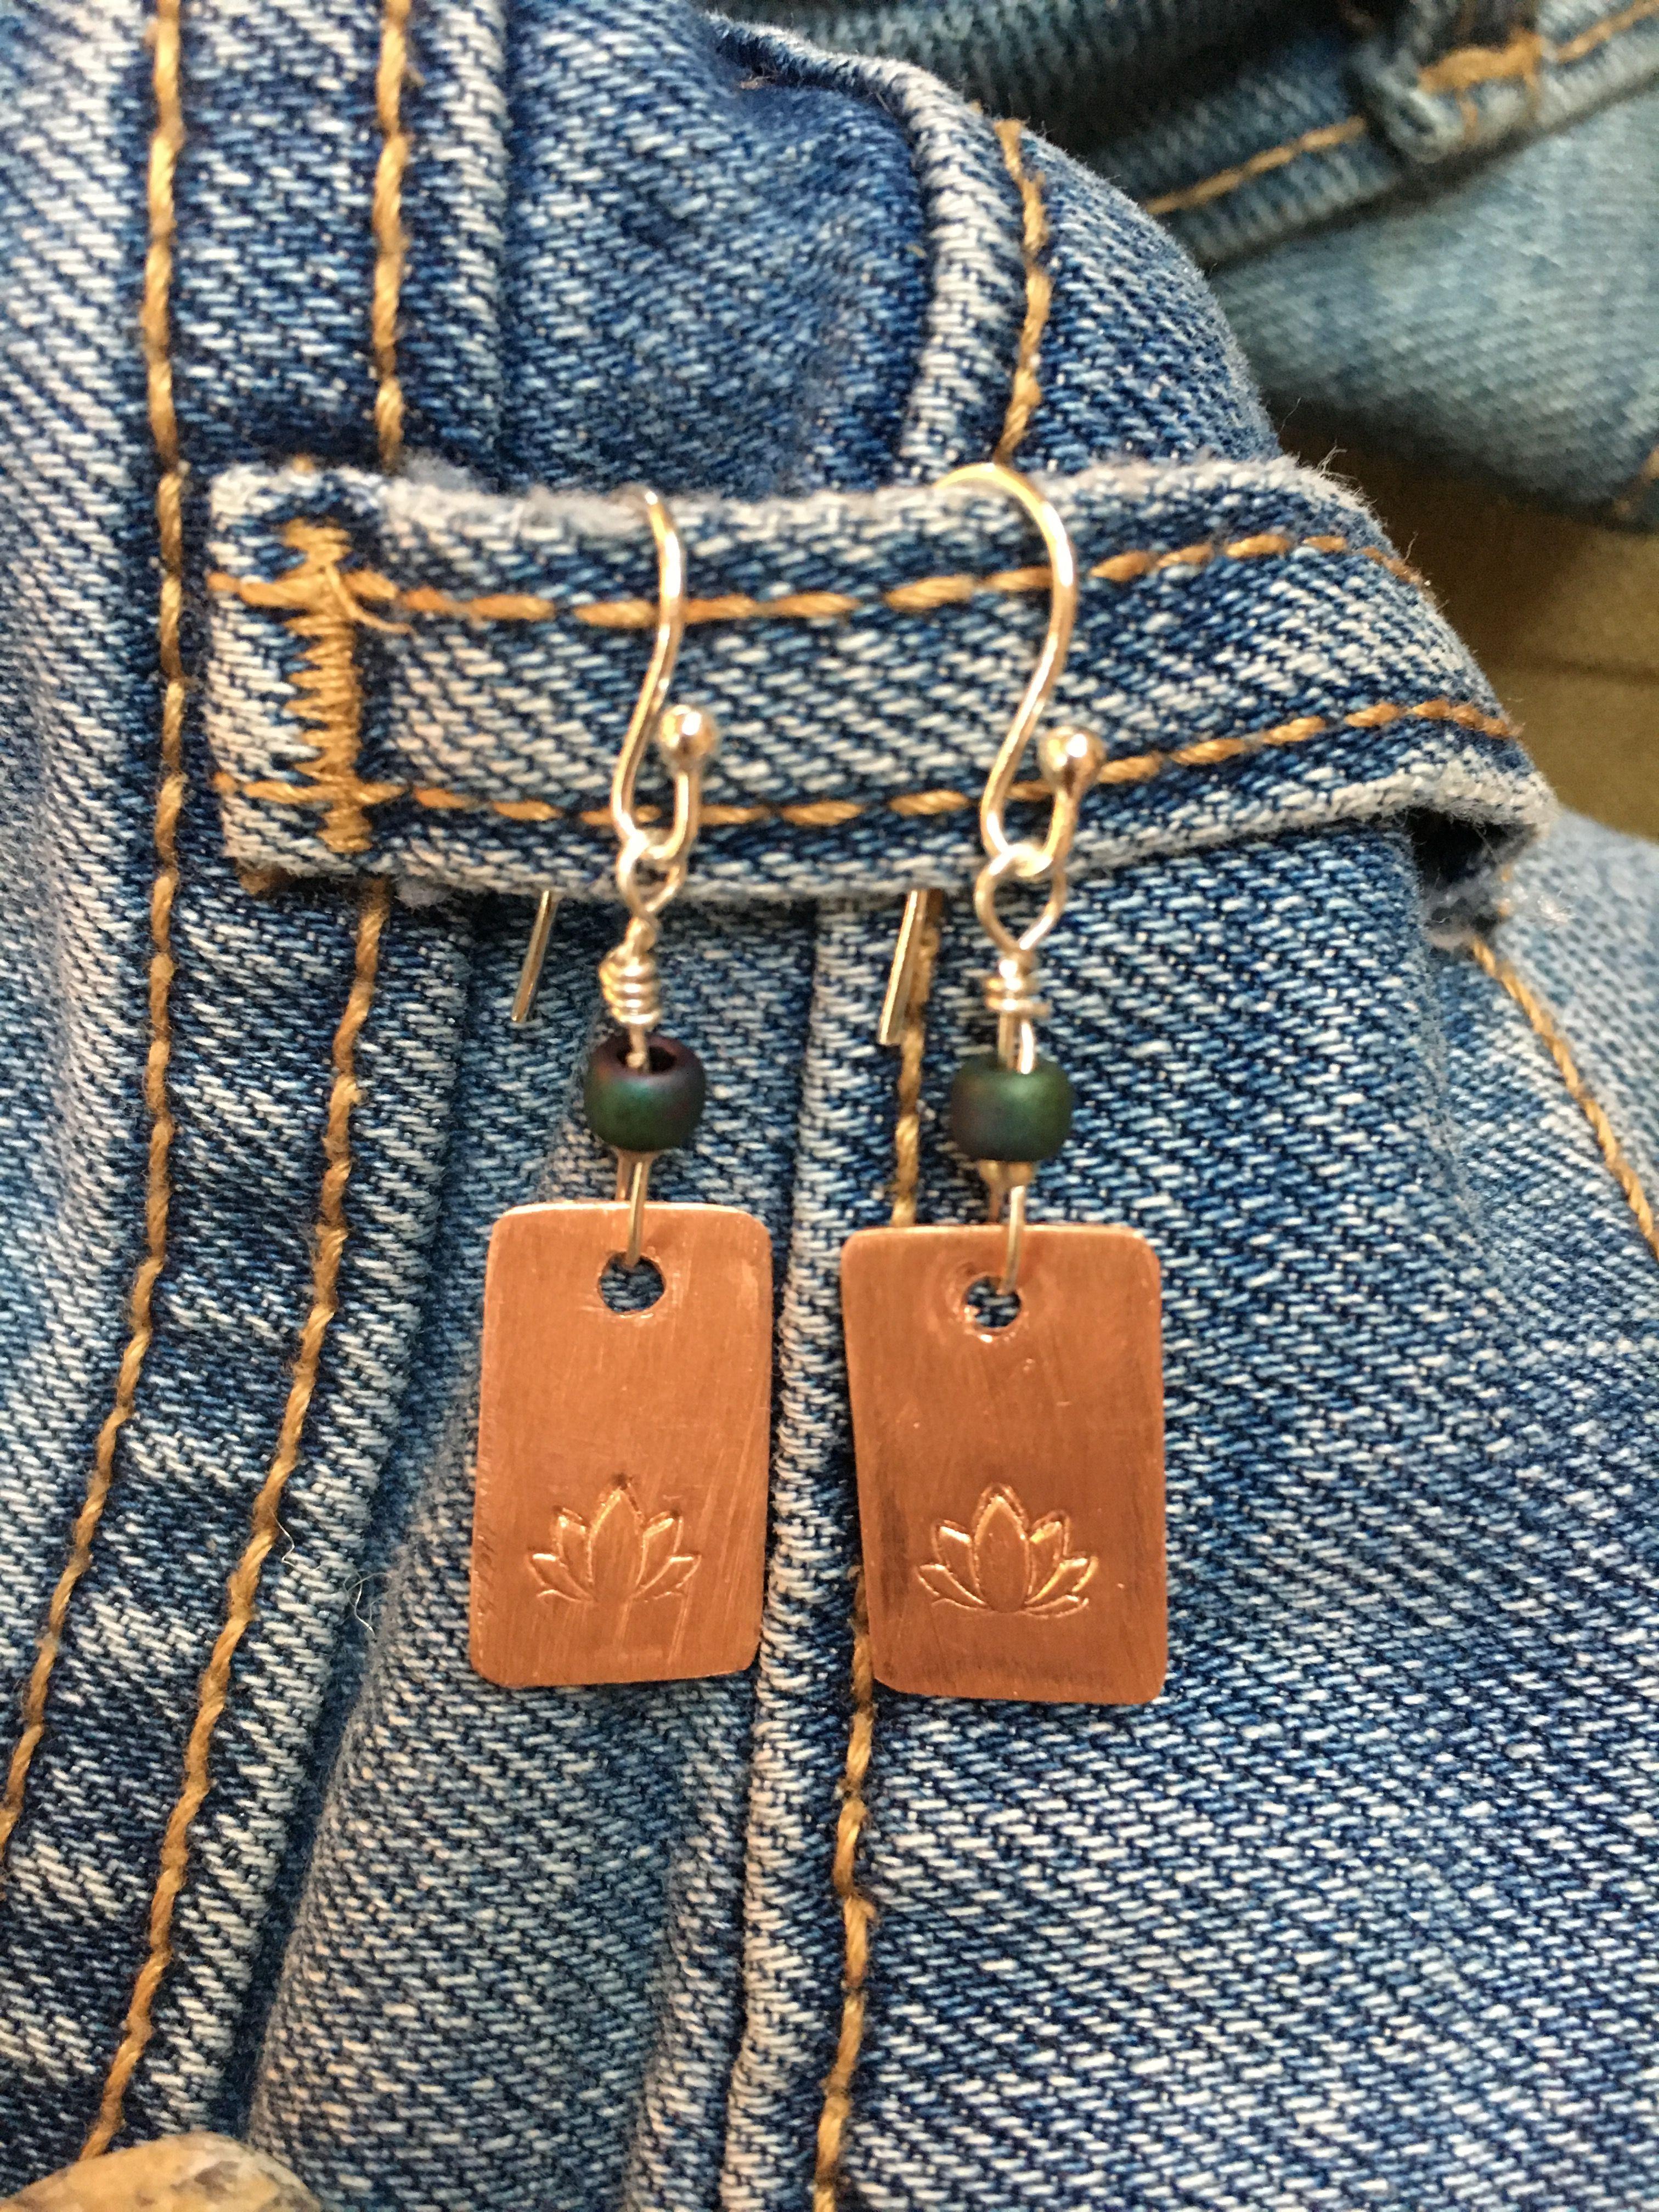 Lil Lotus earrings | Stonedbythesea | Earrings, Lotus, Chain